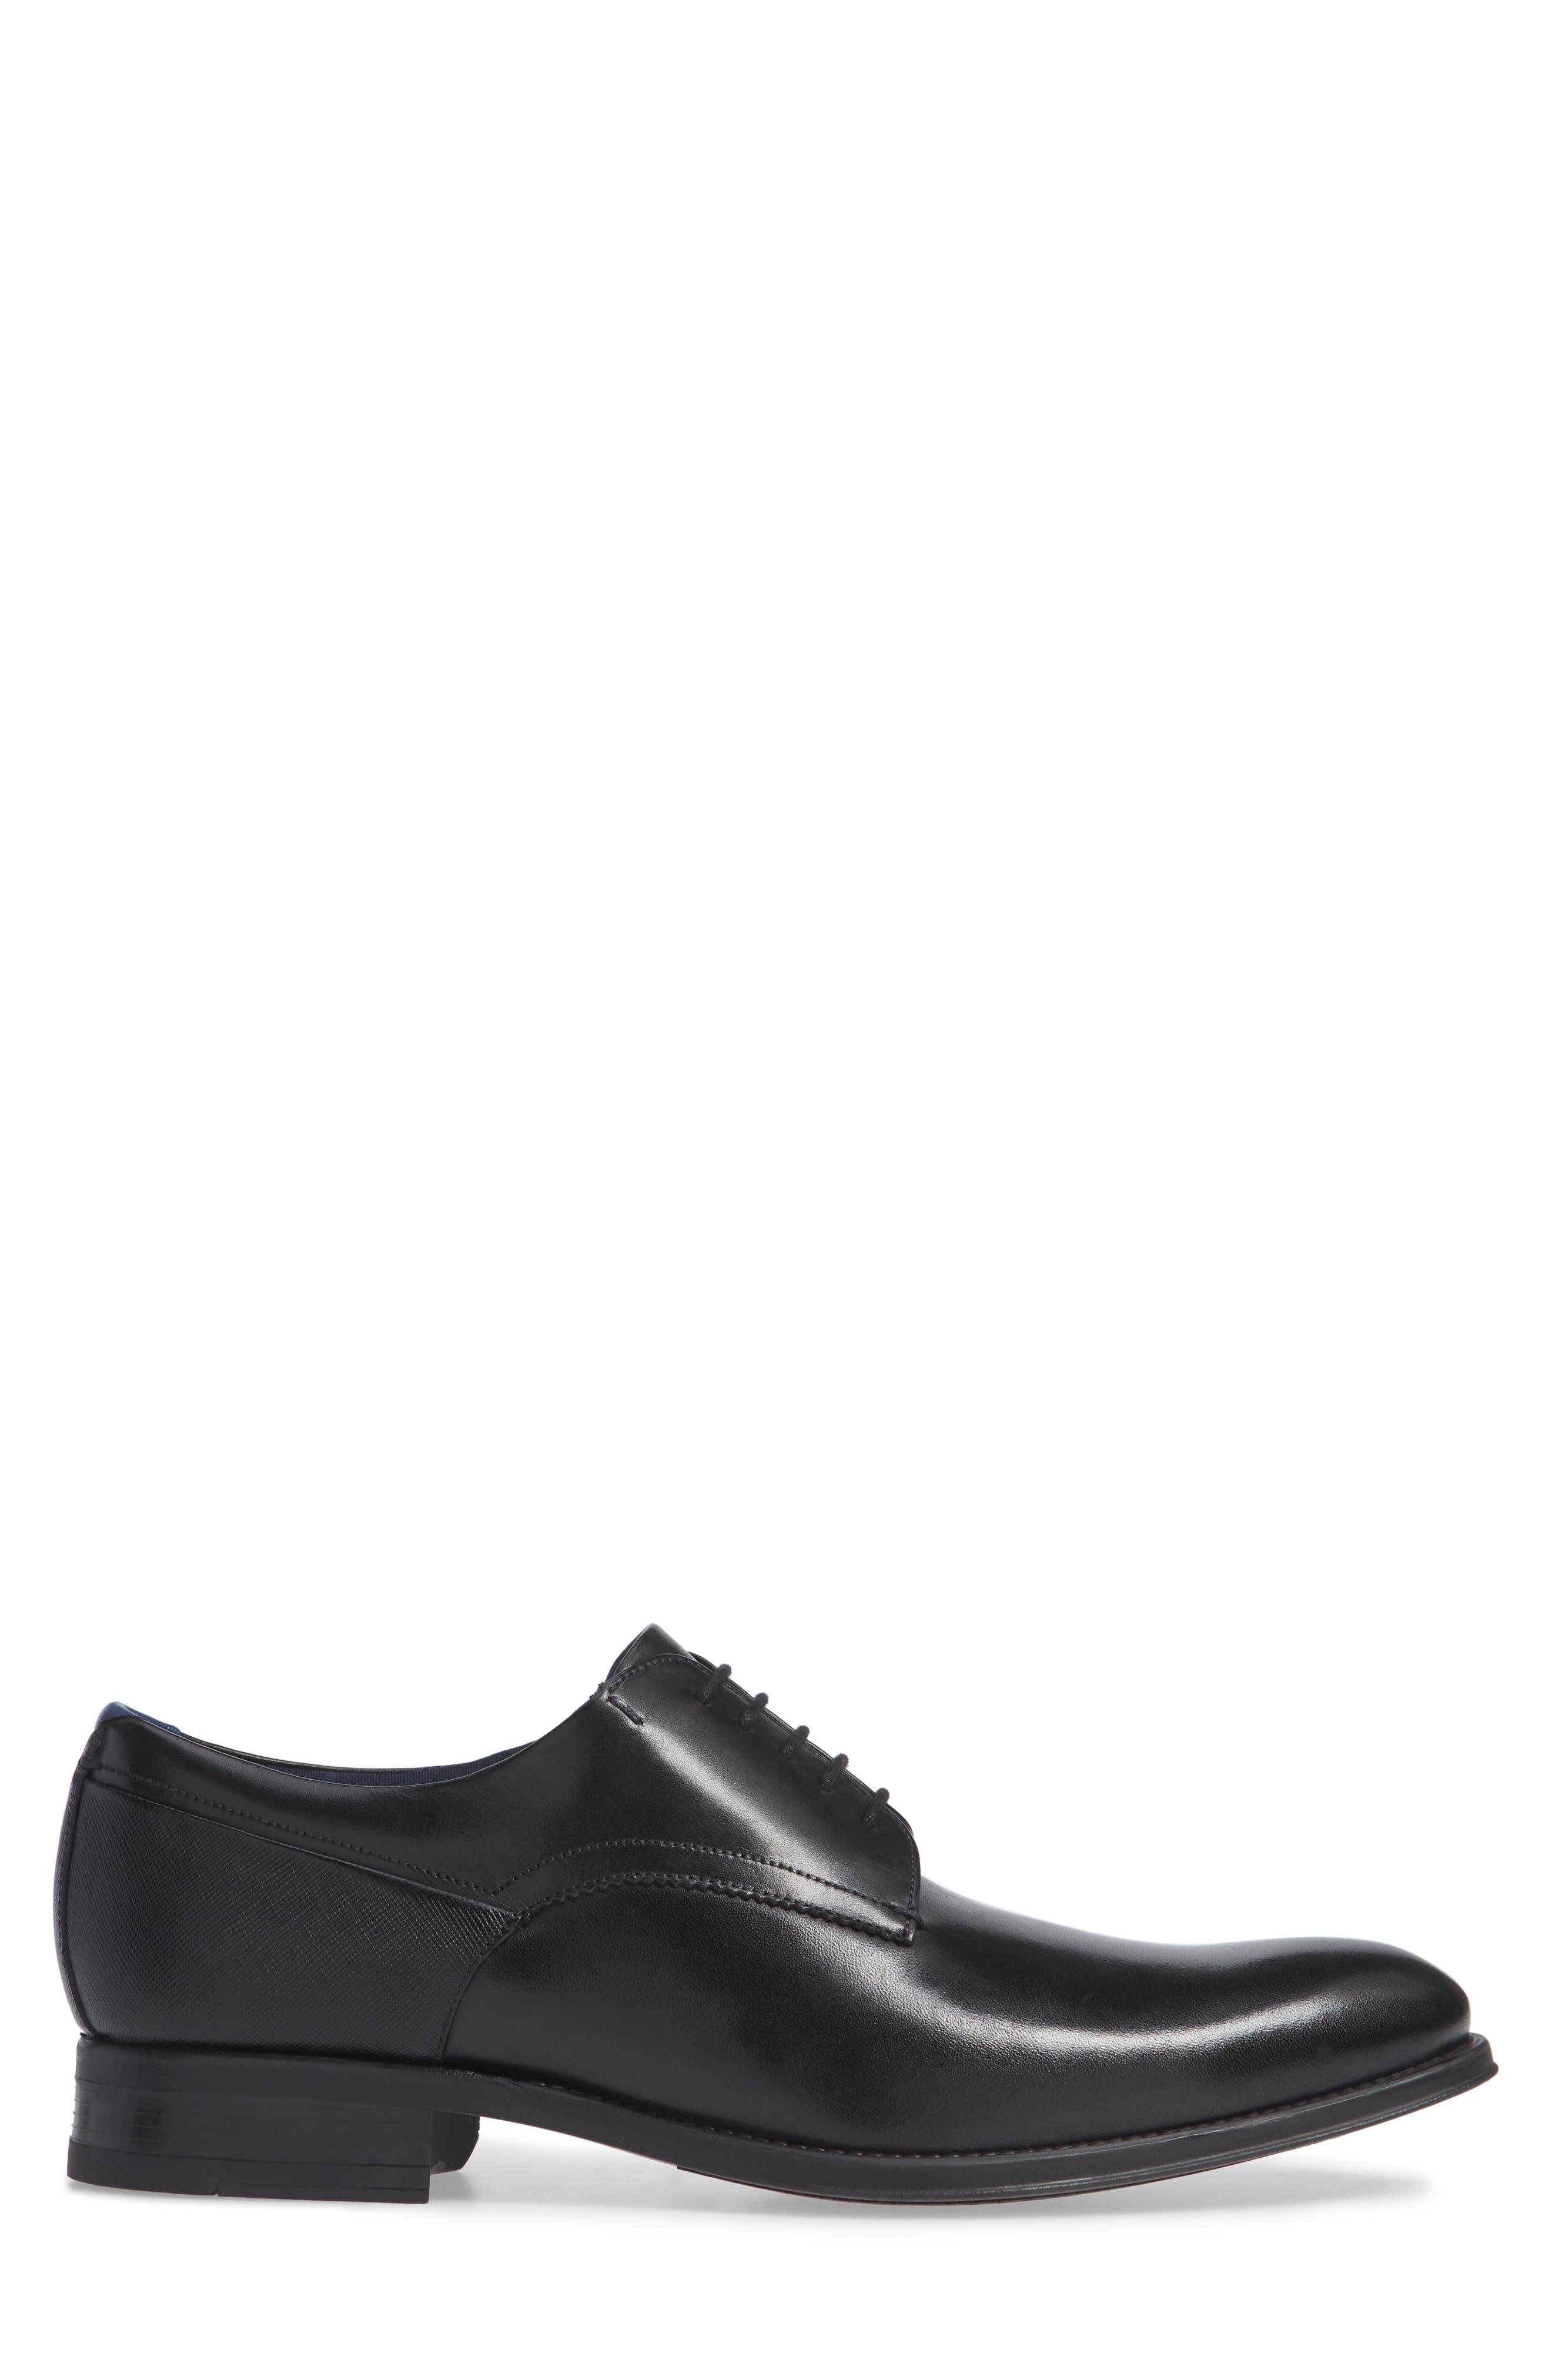 Jusdim Plain Toe Derby,                             Alternate thumbnail 3, color,                             BLACK